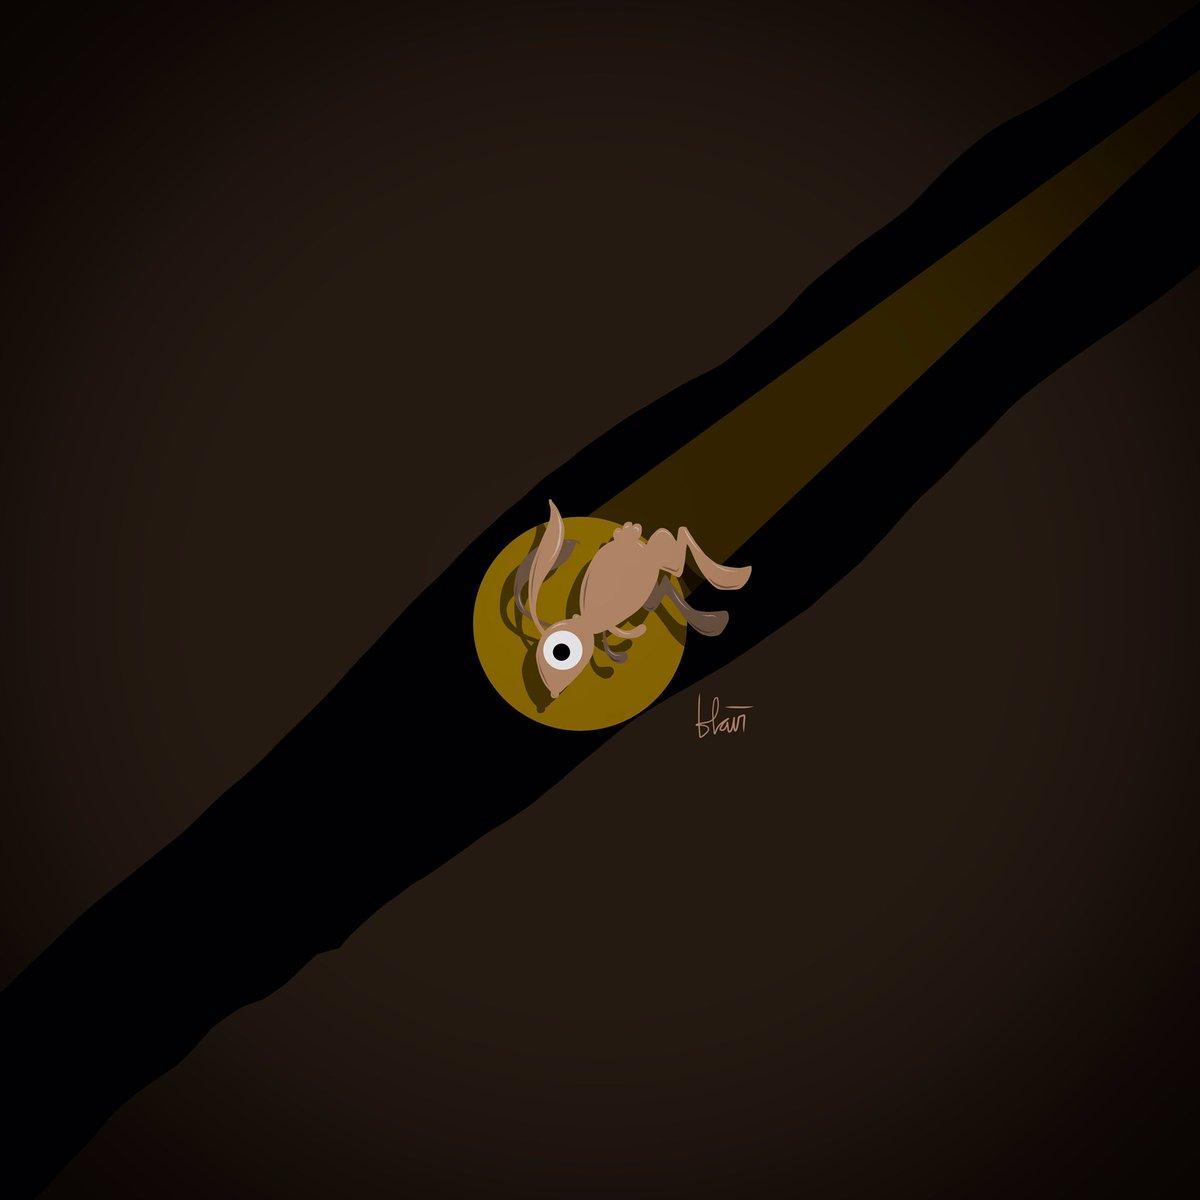 GO DEEPER by gauntt  #rabbit #rabbits #bunny #bunnys #lapin #gethelp #therapy #deep #bygauntt #cartoons #illustrations #artdirector #creativedirectorpic.twitter.com/zJ8DRqBre3